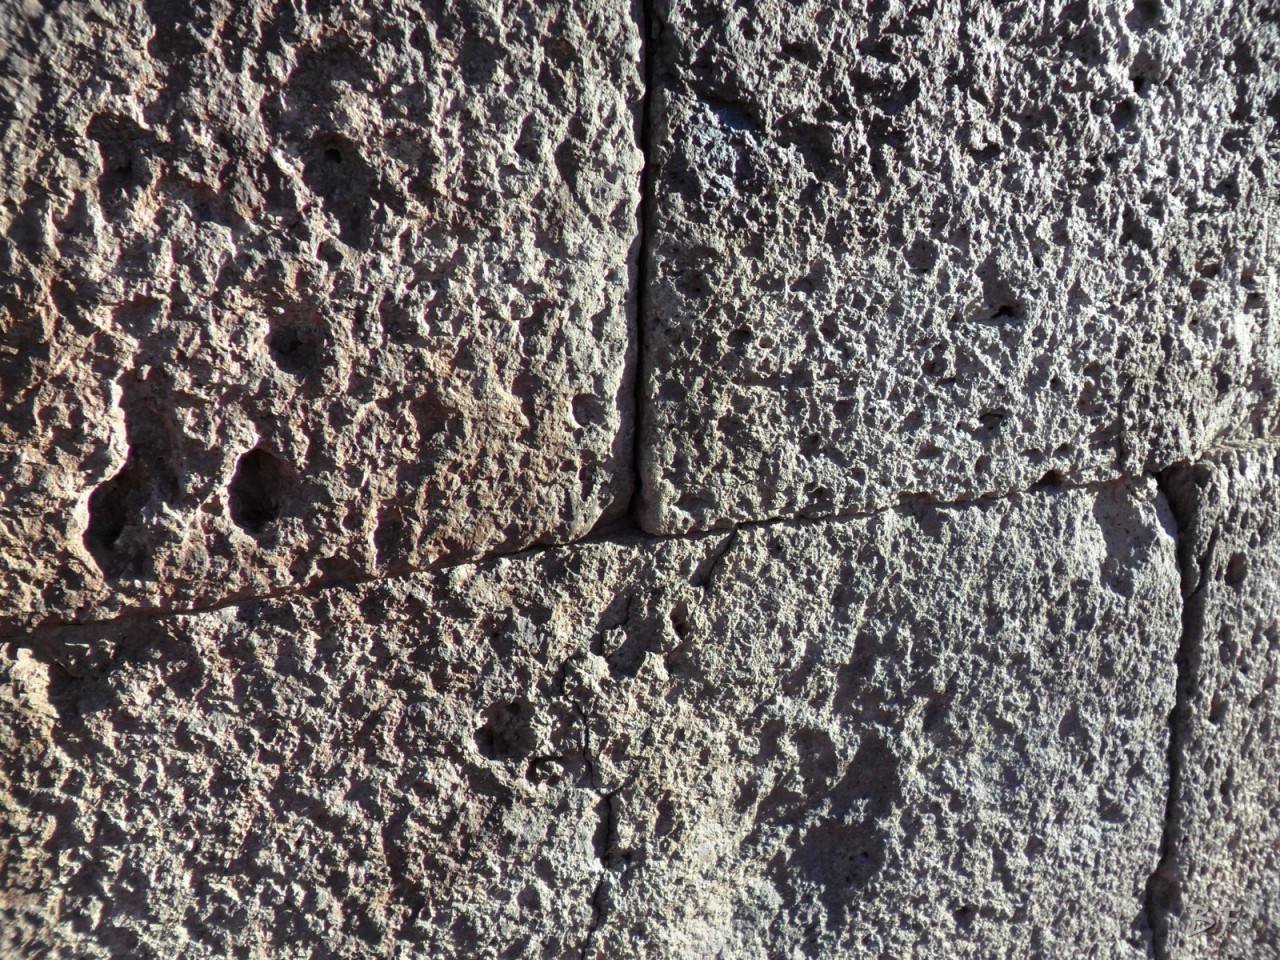 Torri-Poligonali-Megaliti-Sillustani-Puno-Perù-33